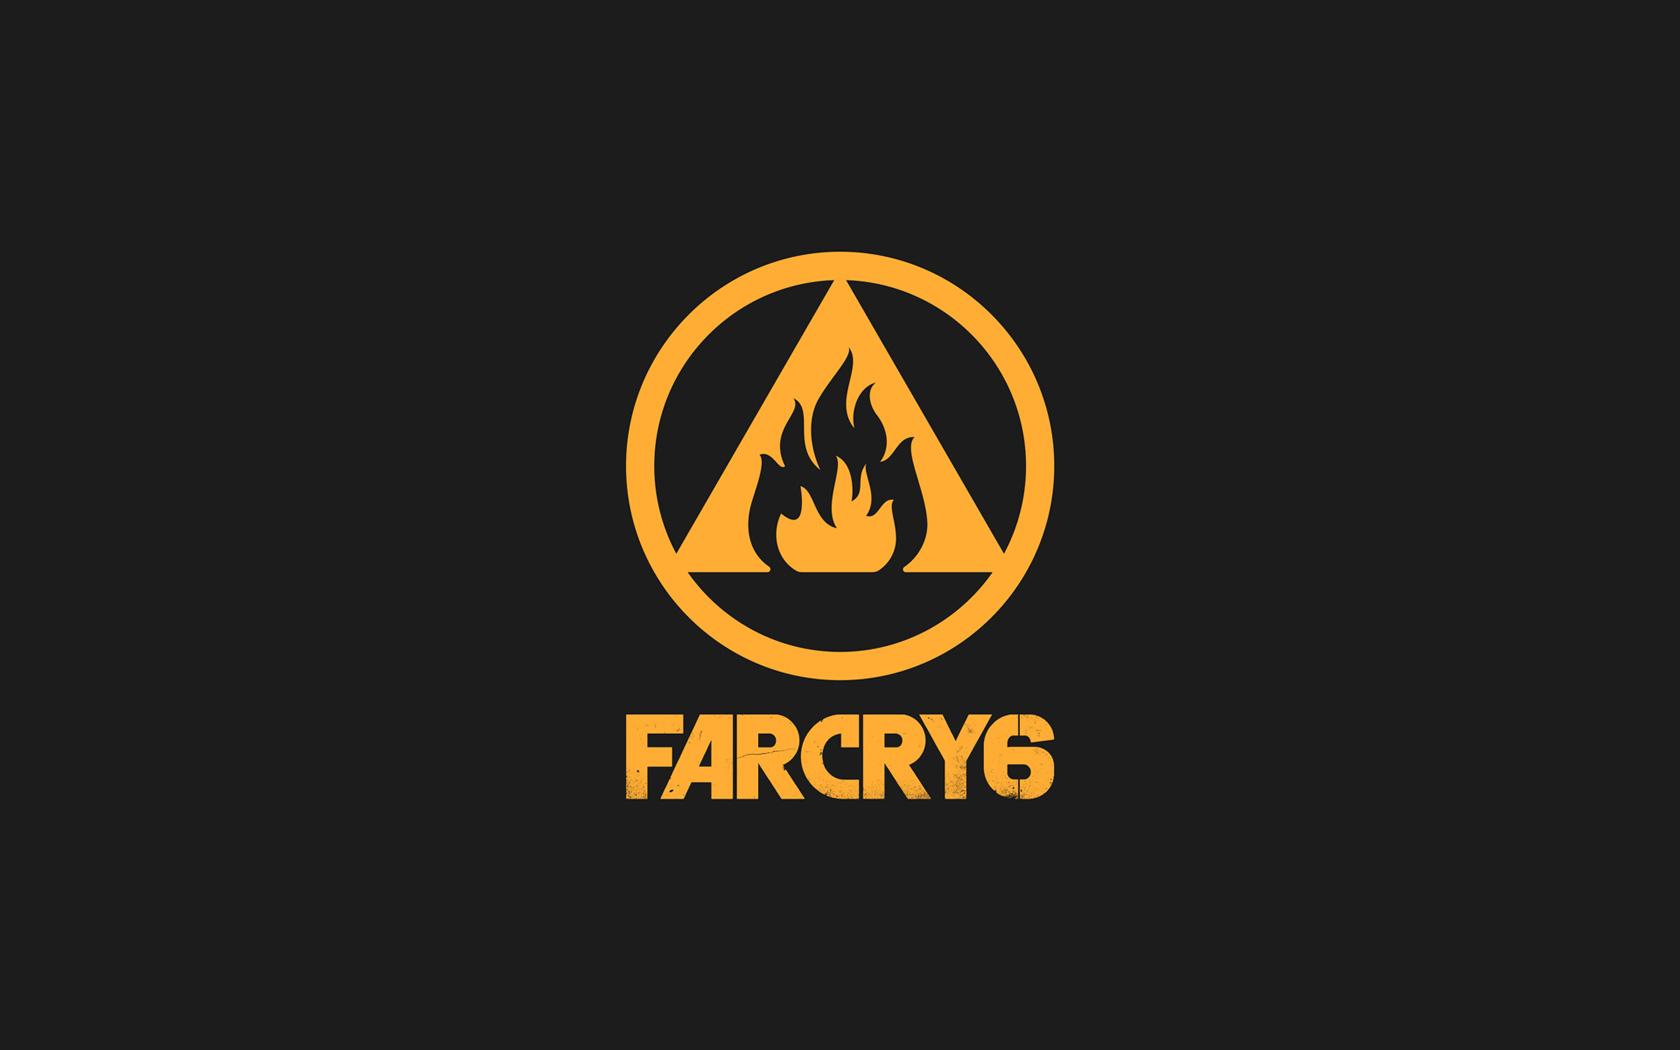 Far Cry 6 Wallpaper in 1680x1050